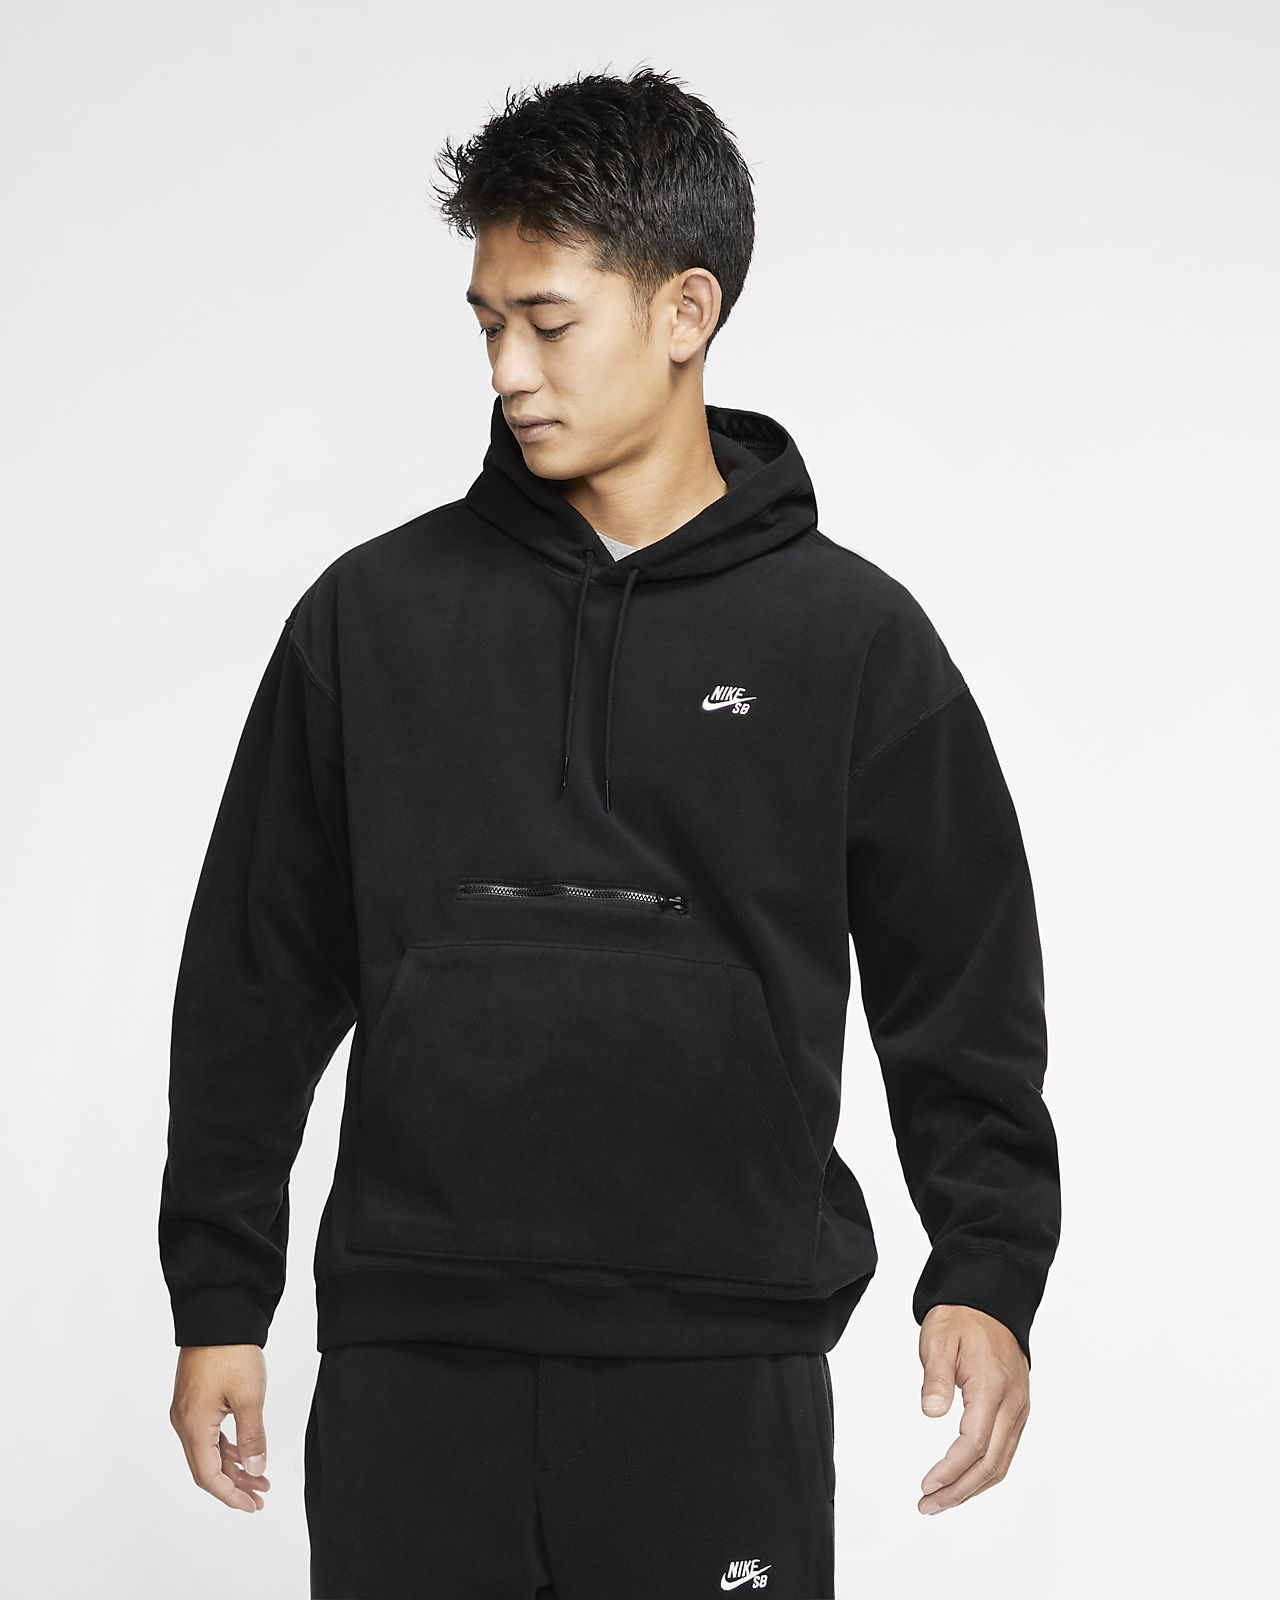 Nike SB Erkek Kaykay Kapüşonlu Üst